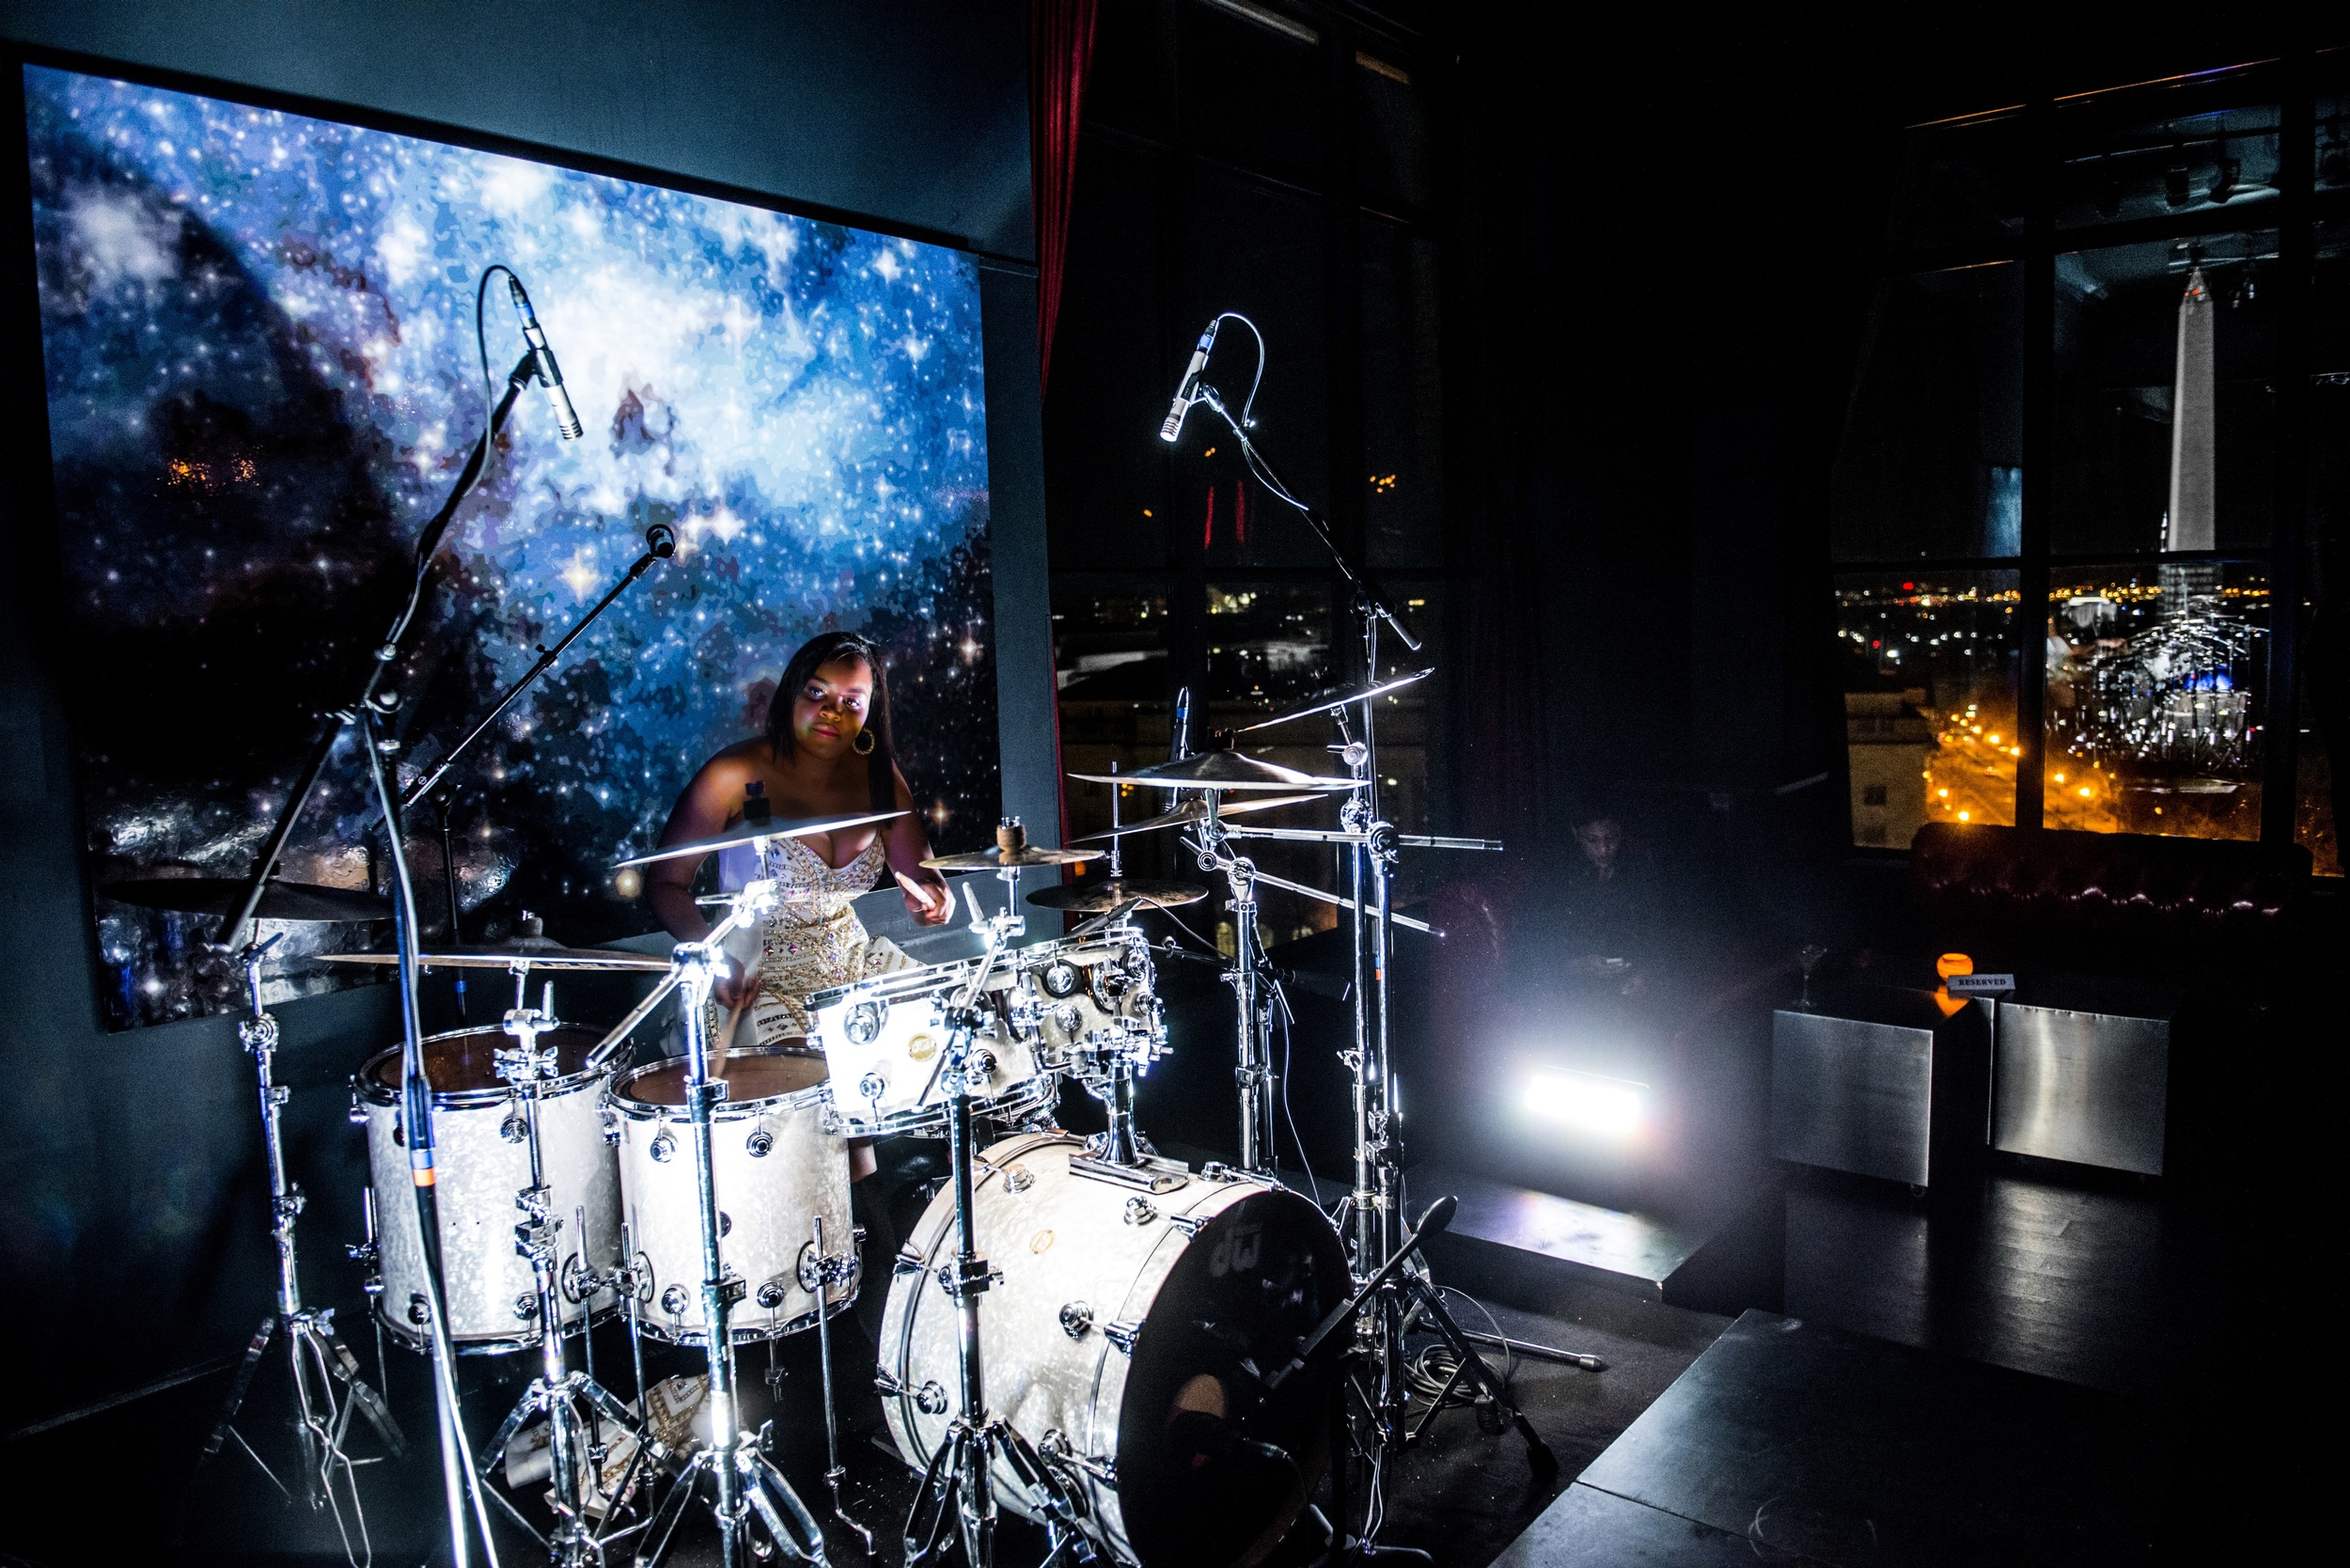 Glorious, Livetronica Drummer, Pop-R&B Singer, Producer, Live at W Washington, POV 28 - 99.jpg